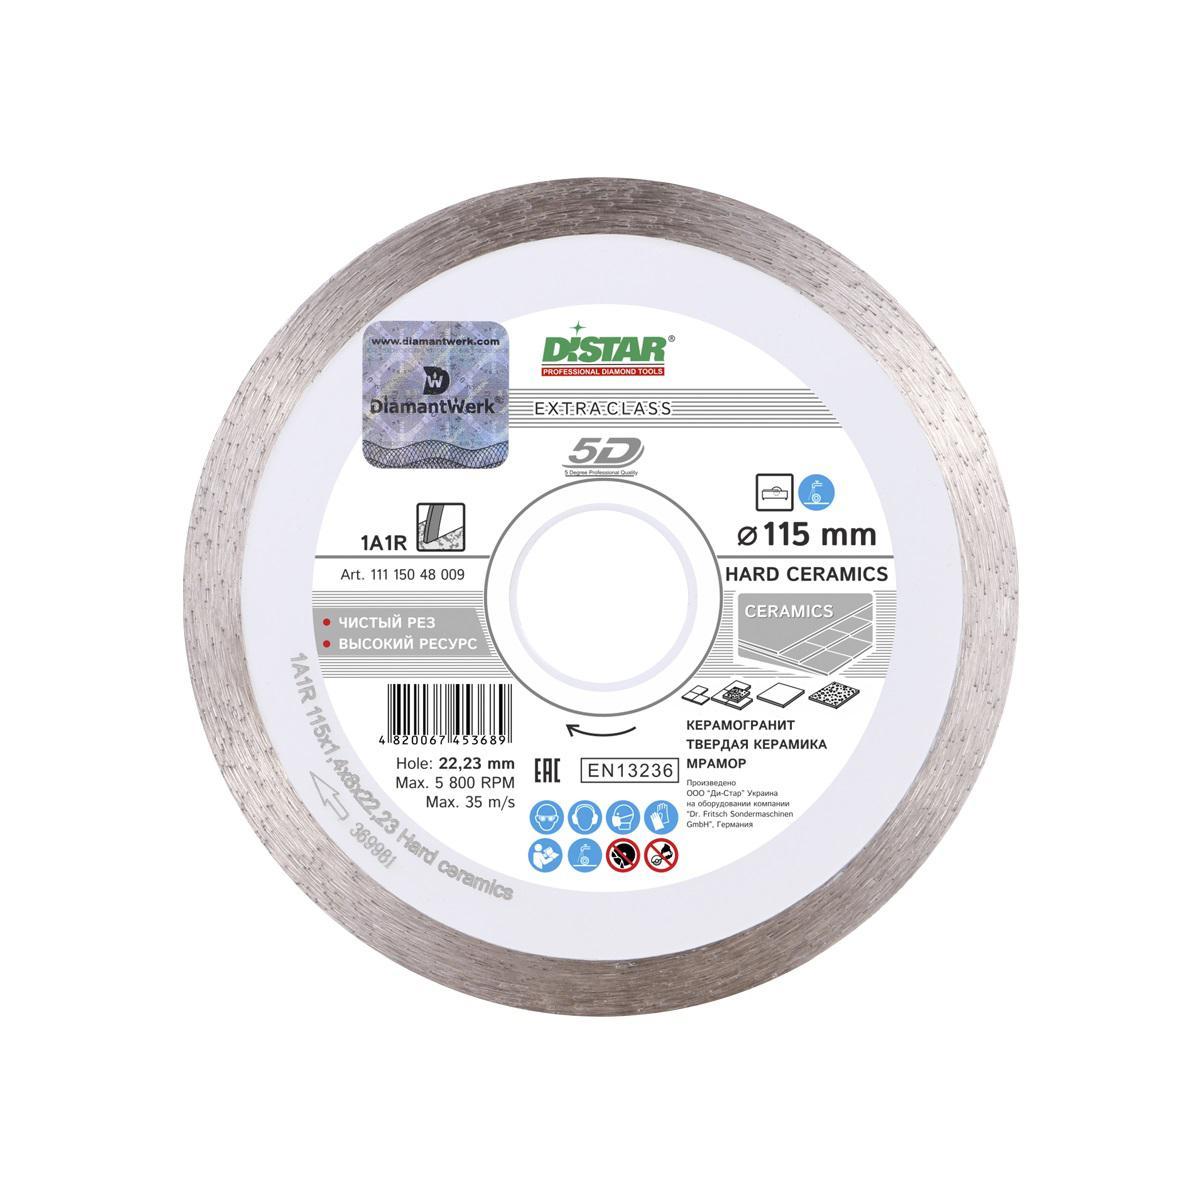 Круг алмазный Di-star 1a1r hard ceramics rp25t 249815 115 Х 22 диск алмазный distar 1a1r 180x25мм hard ceramics